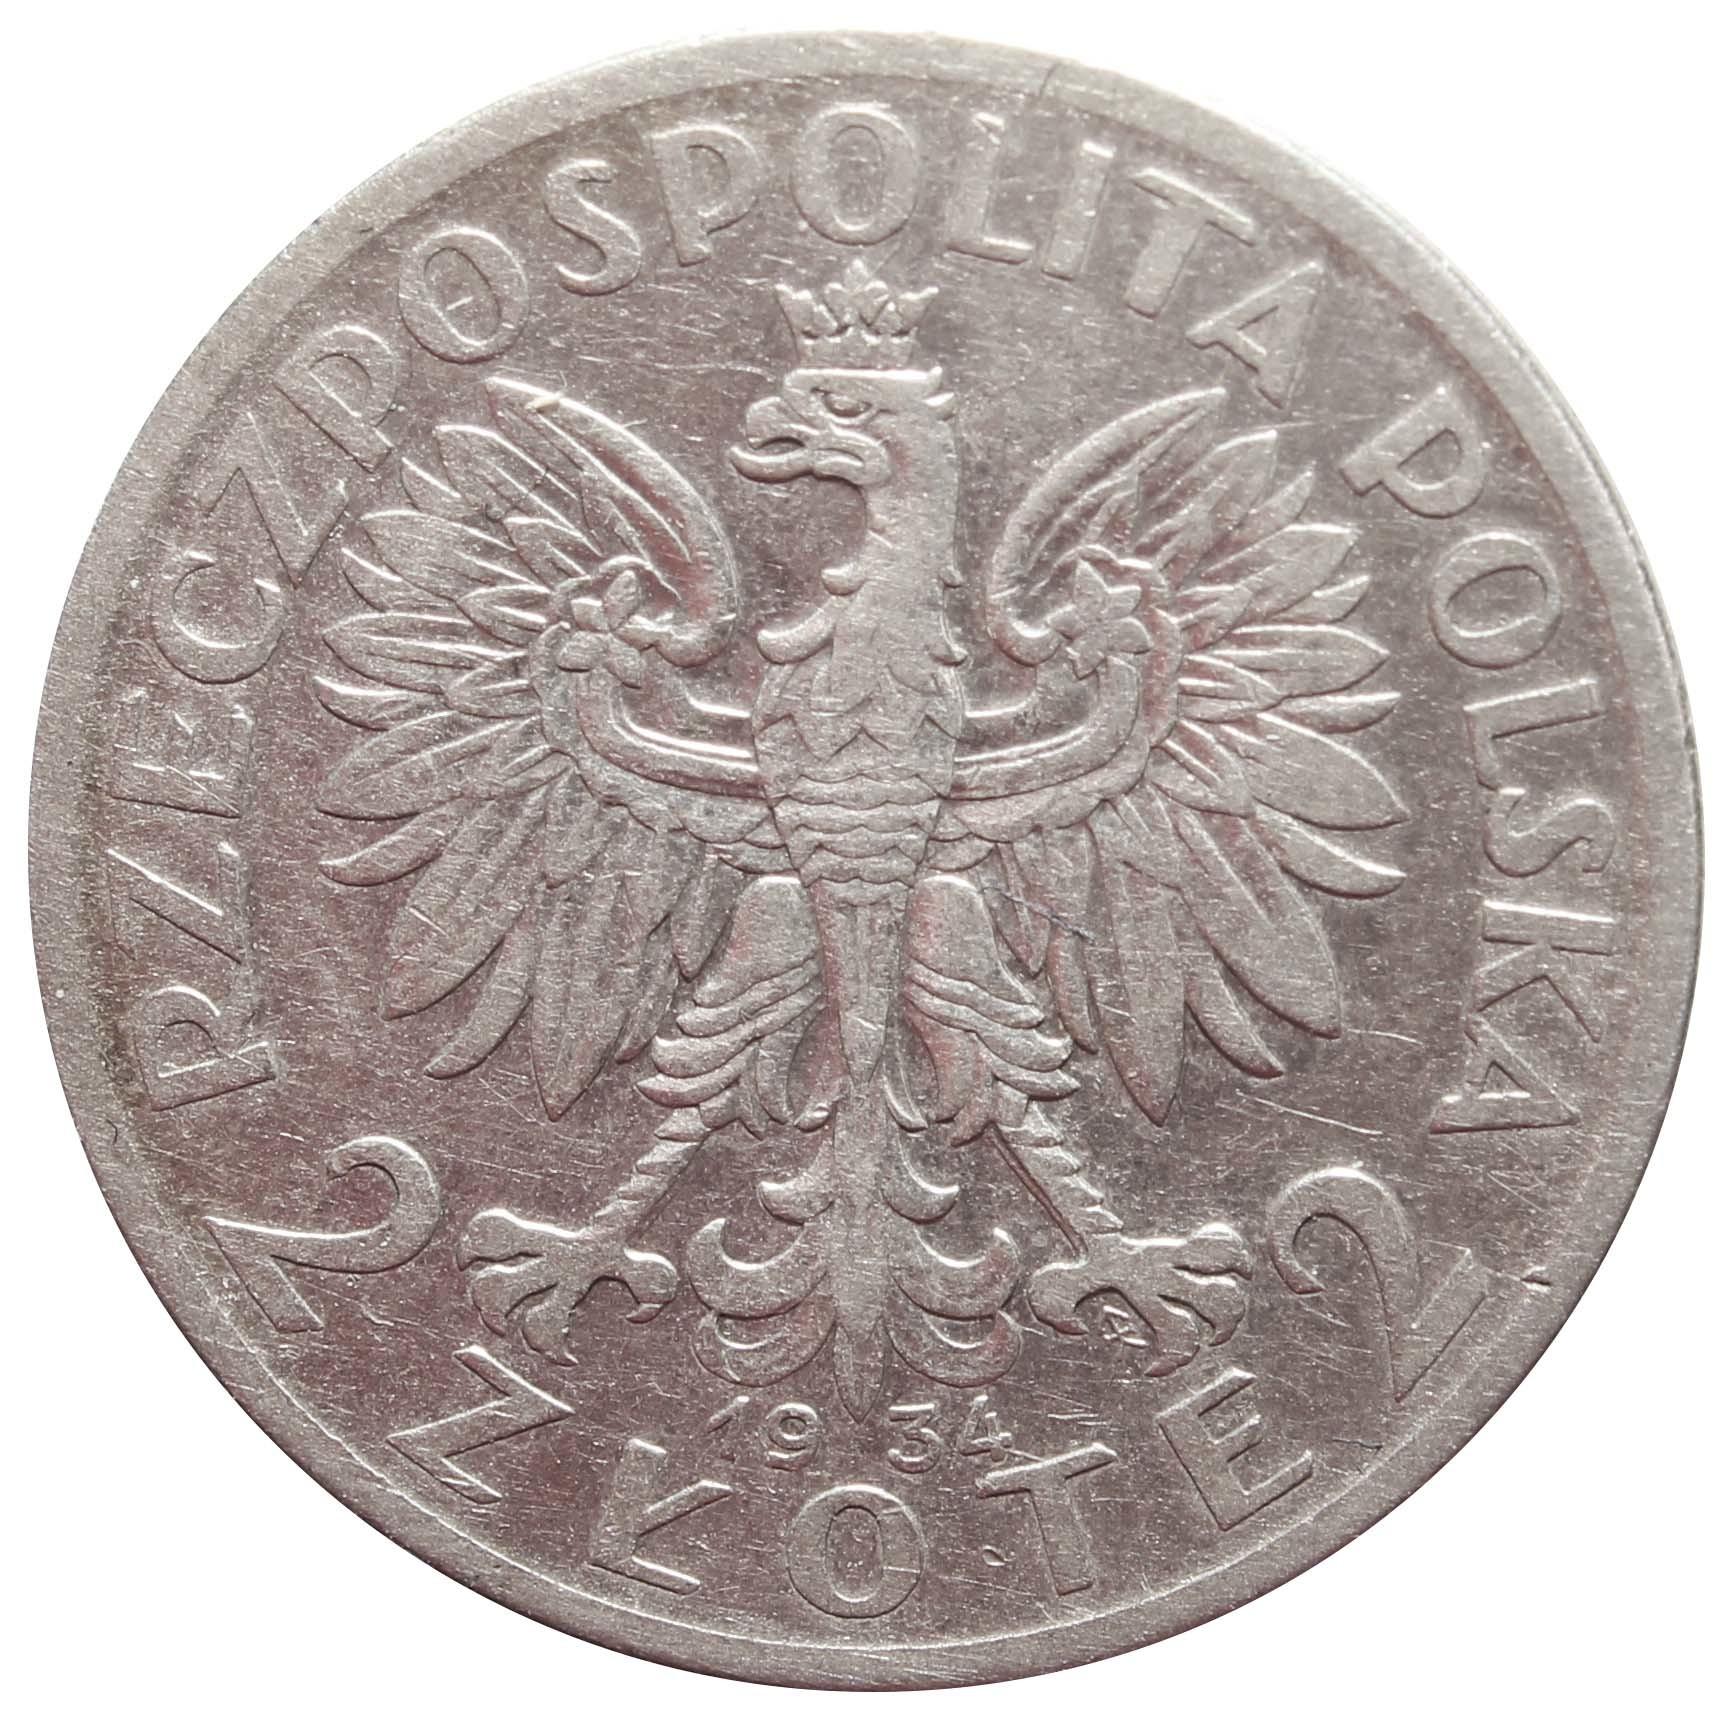 2 золотых. Ядвига. Польша. 1934 год. VF-XF